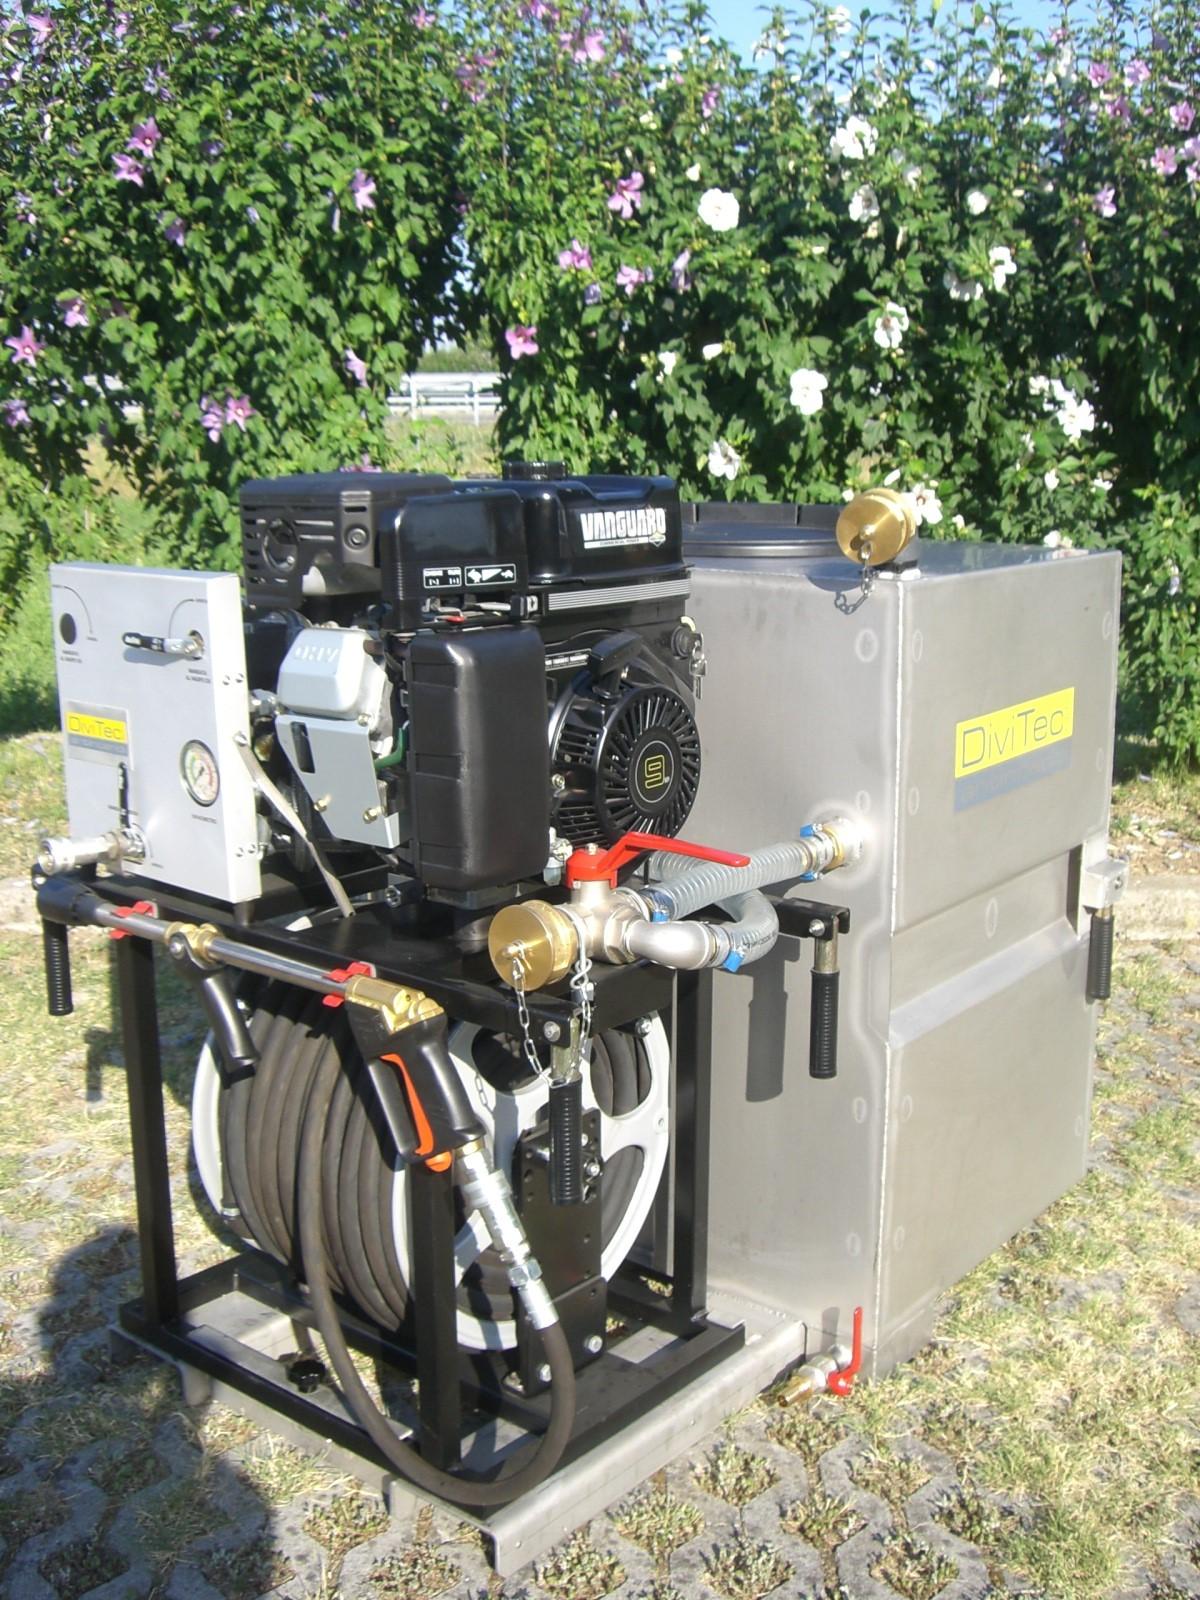 Modulo antincendio dt-400-sds diesel con miscelatore ap